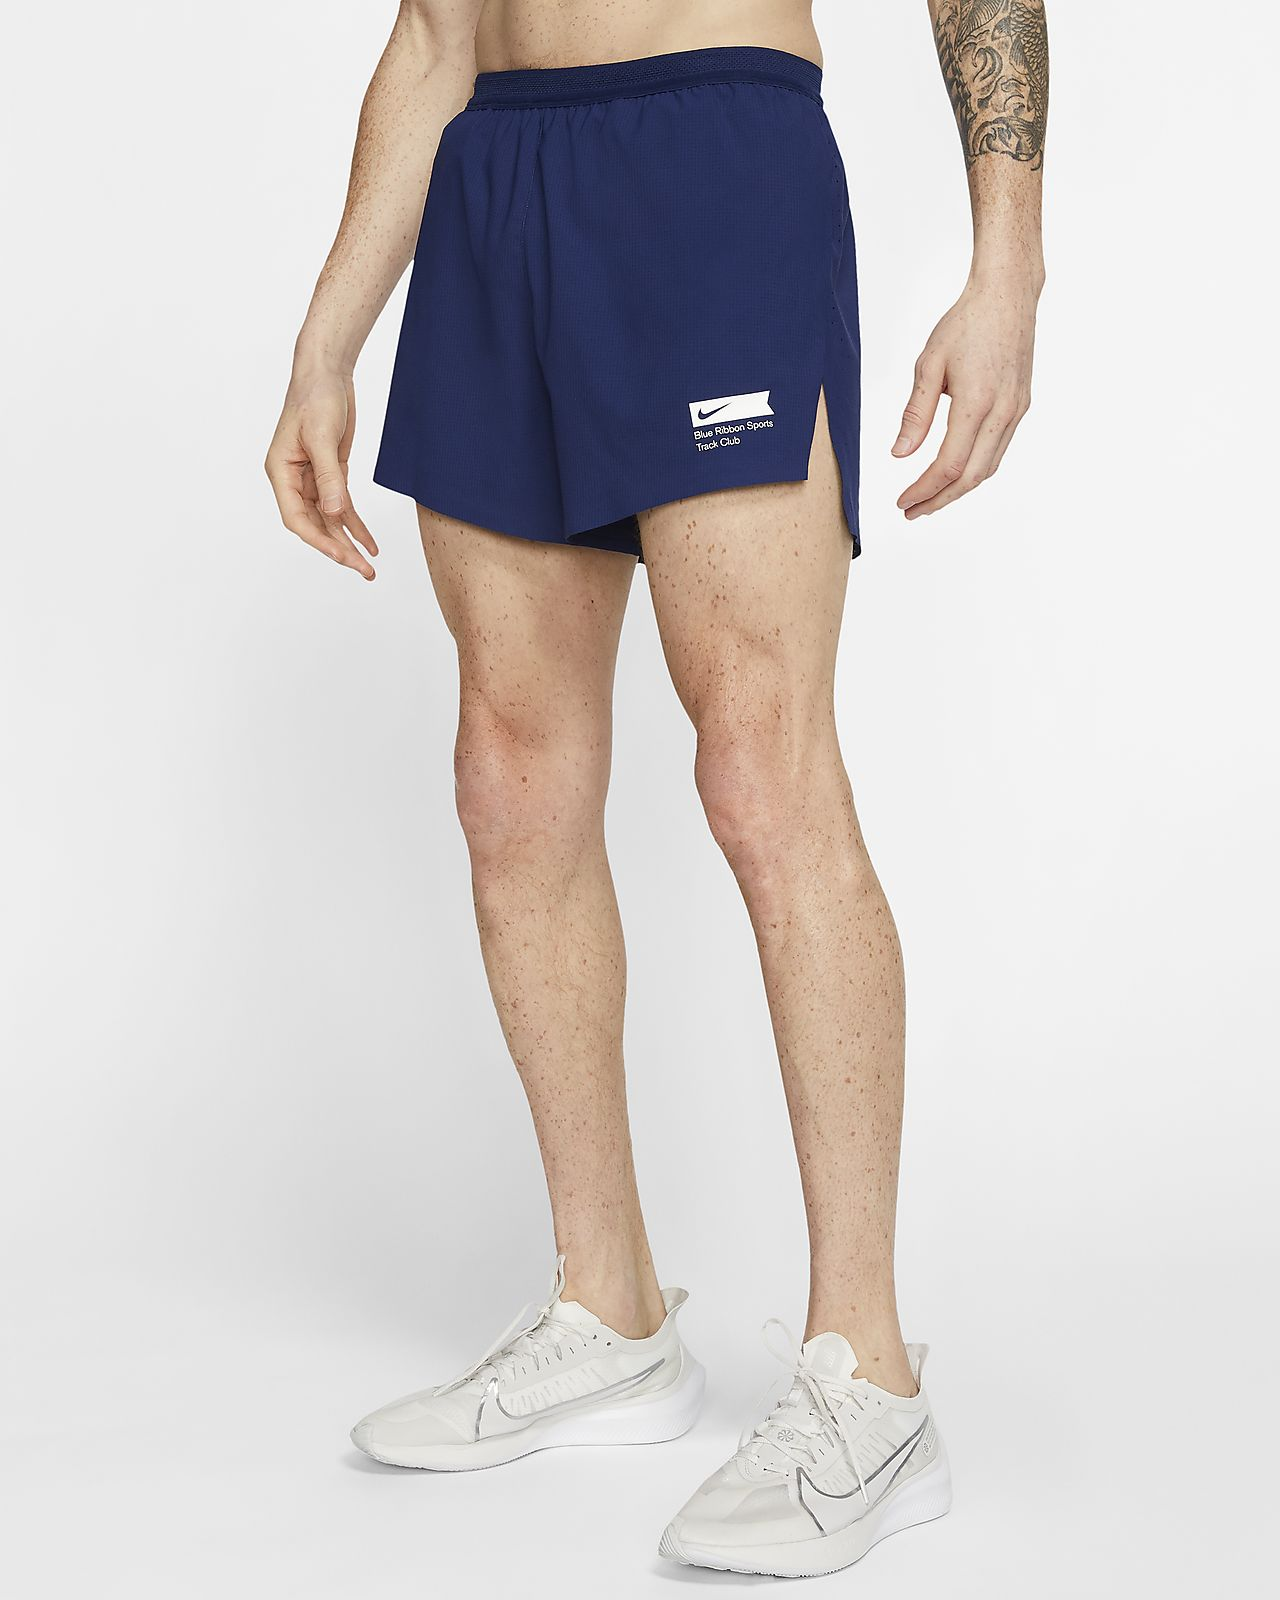 Беговые шорты Nike AeroSwift Blue Ribbon Sports 11 см